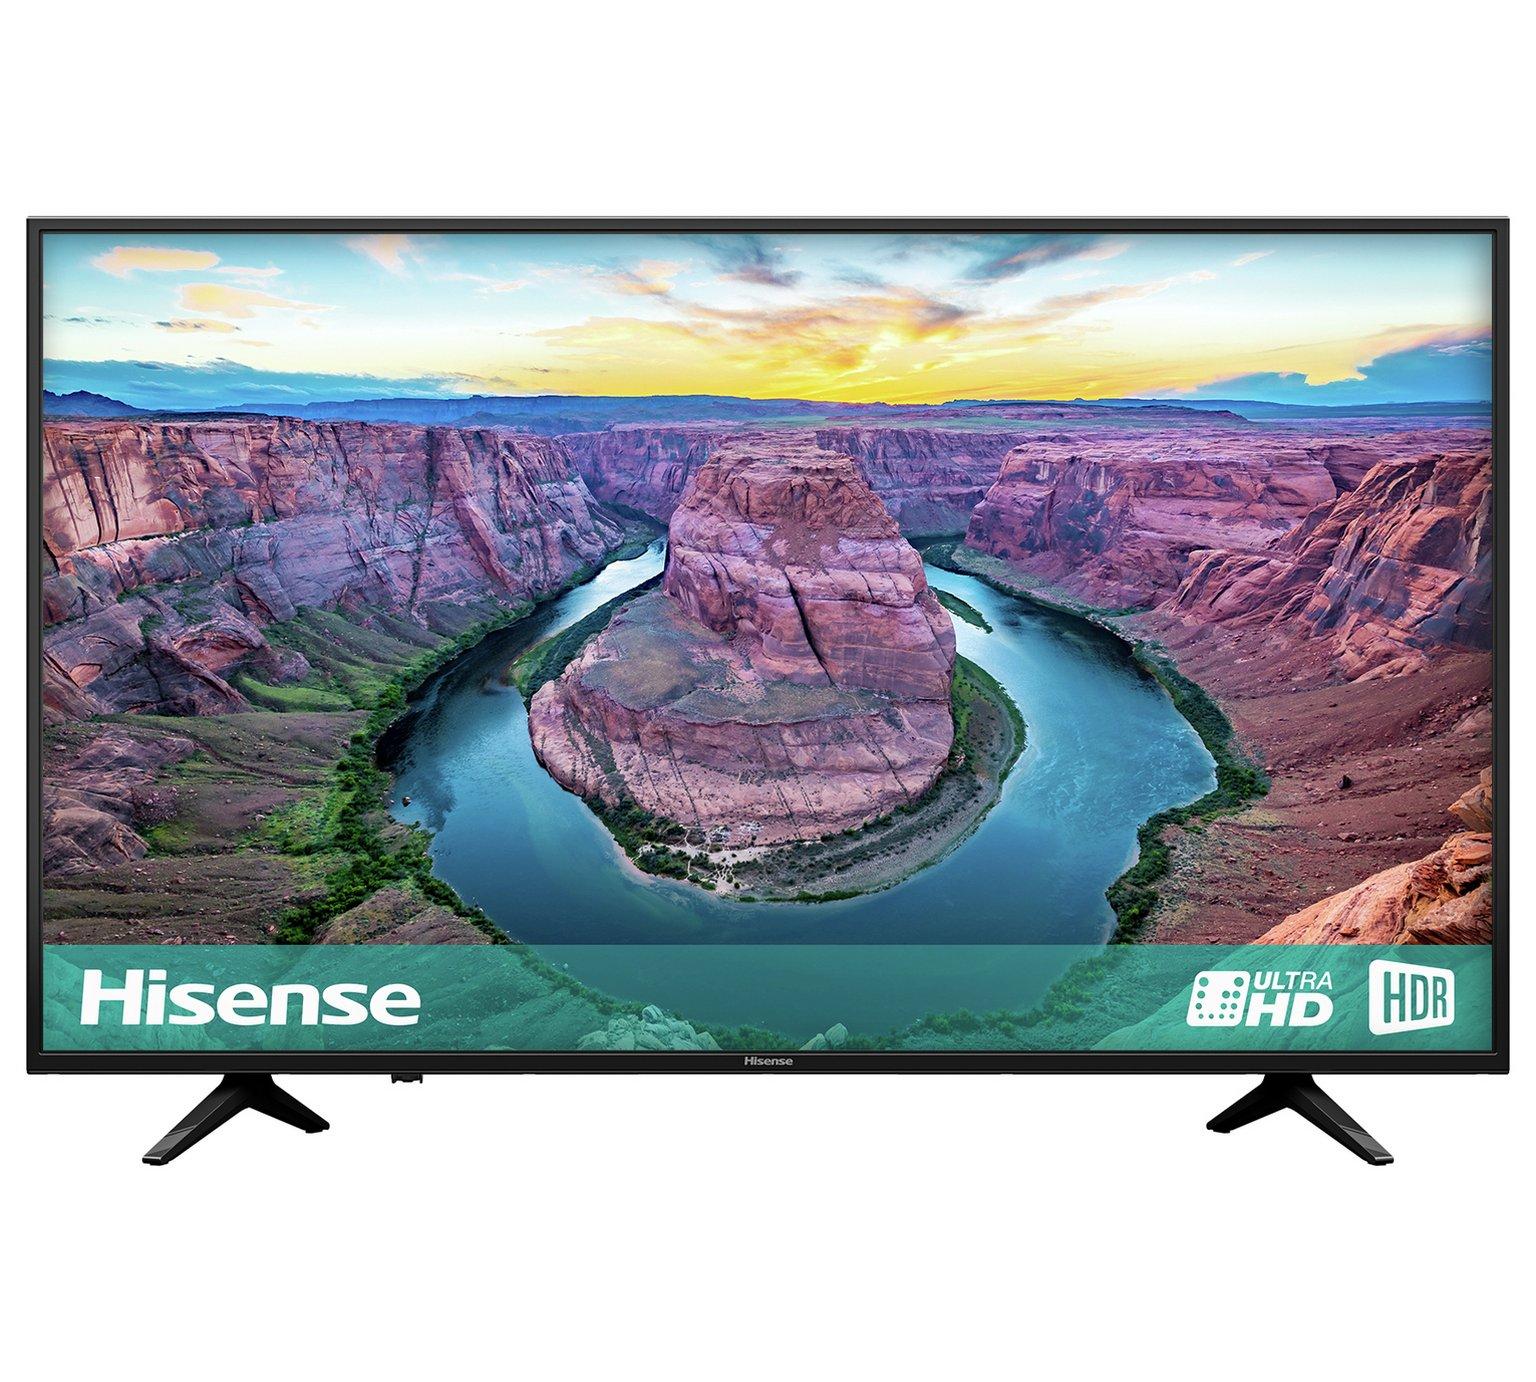 Hisense 50 Inch H50AE6100UK Smart 4K UHD TV with HDR